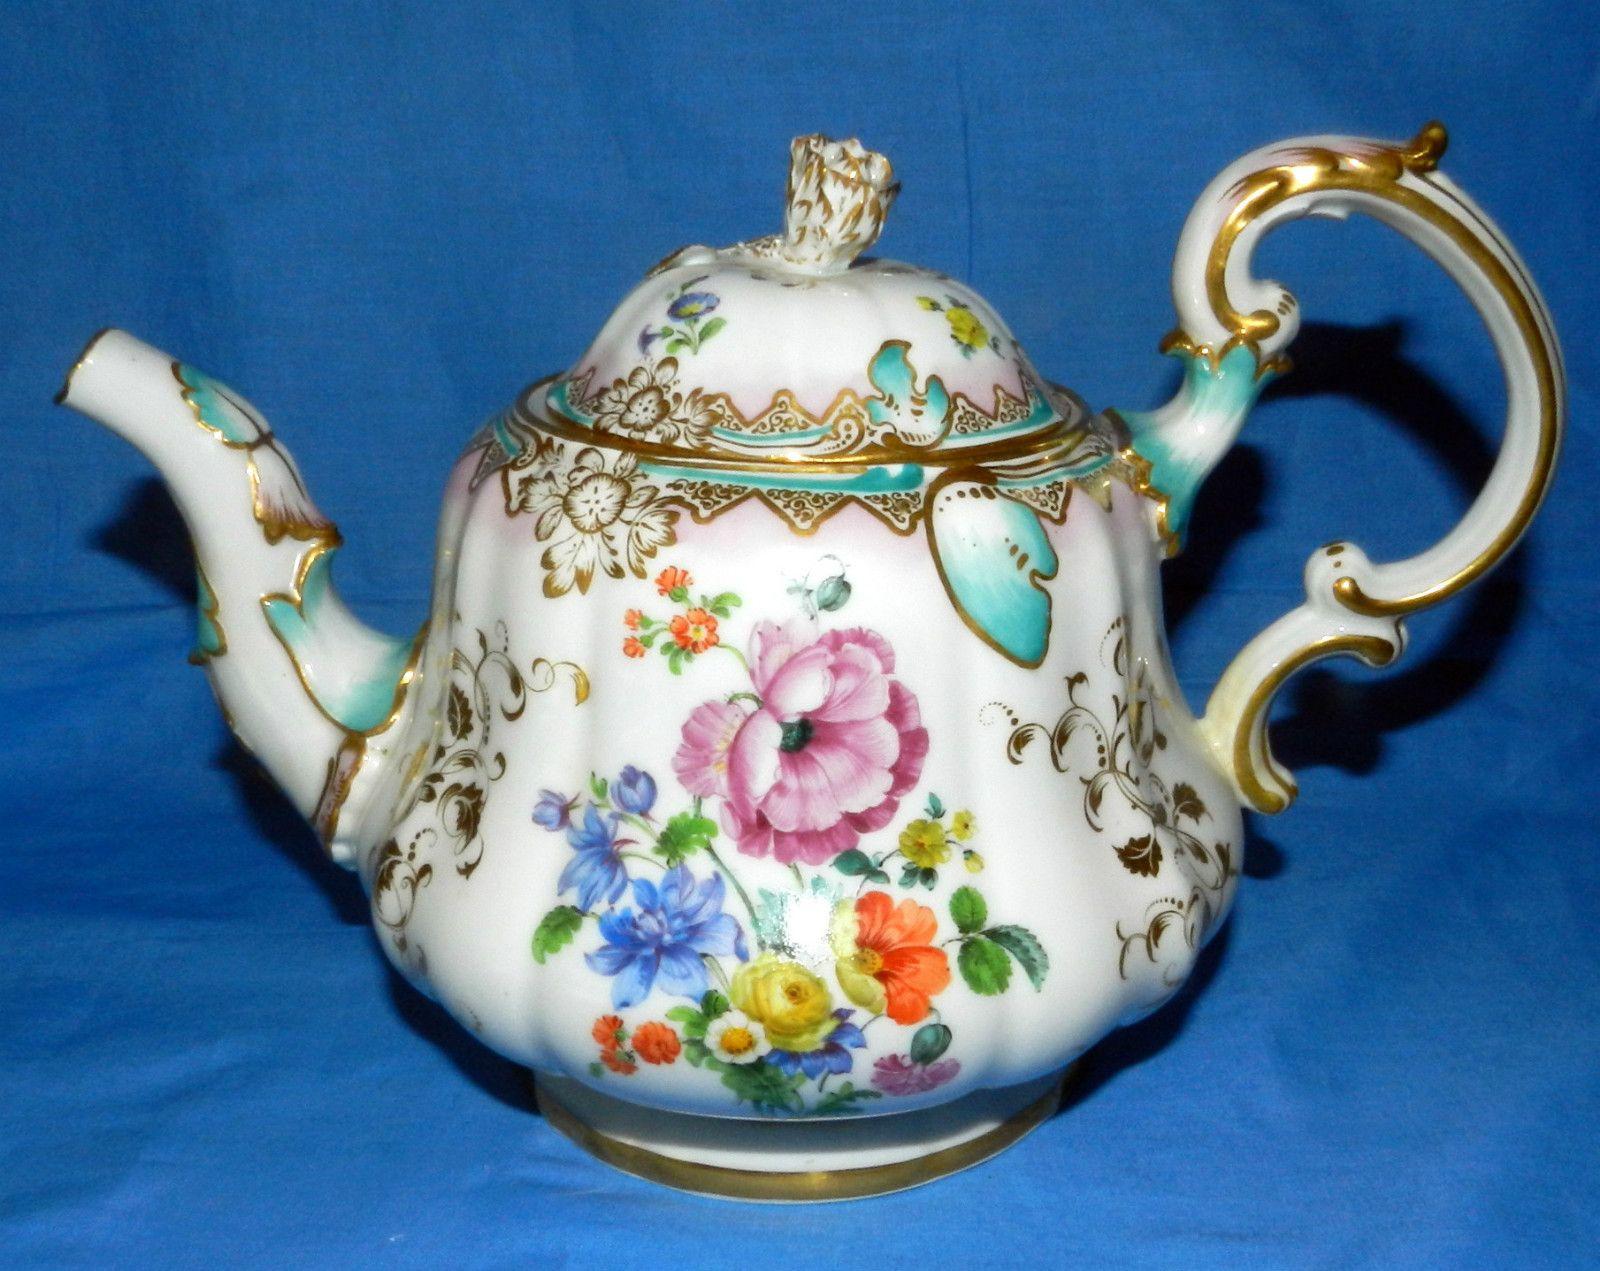 Handmade Raised Cloisonne Teapot